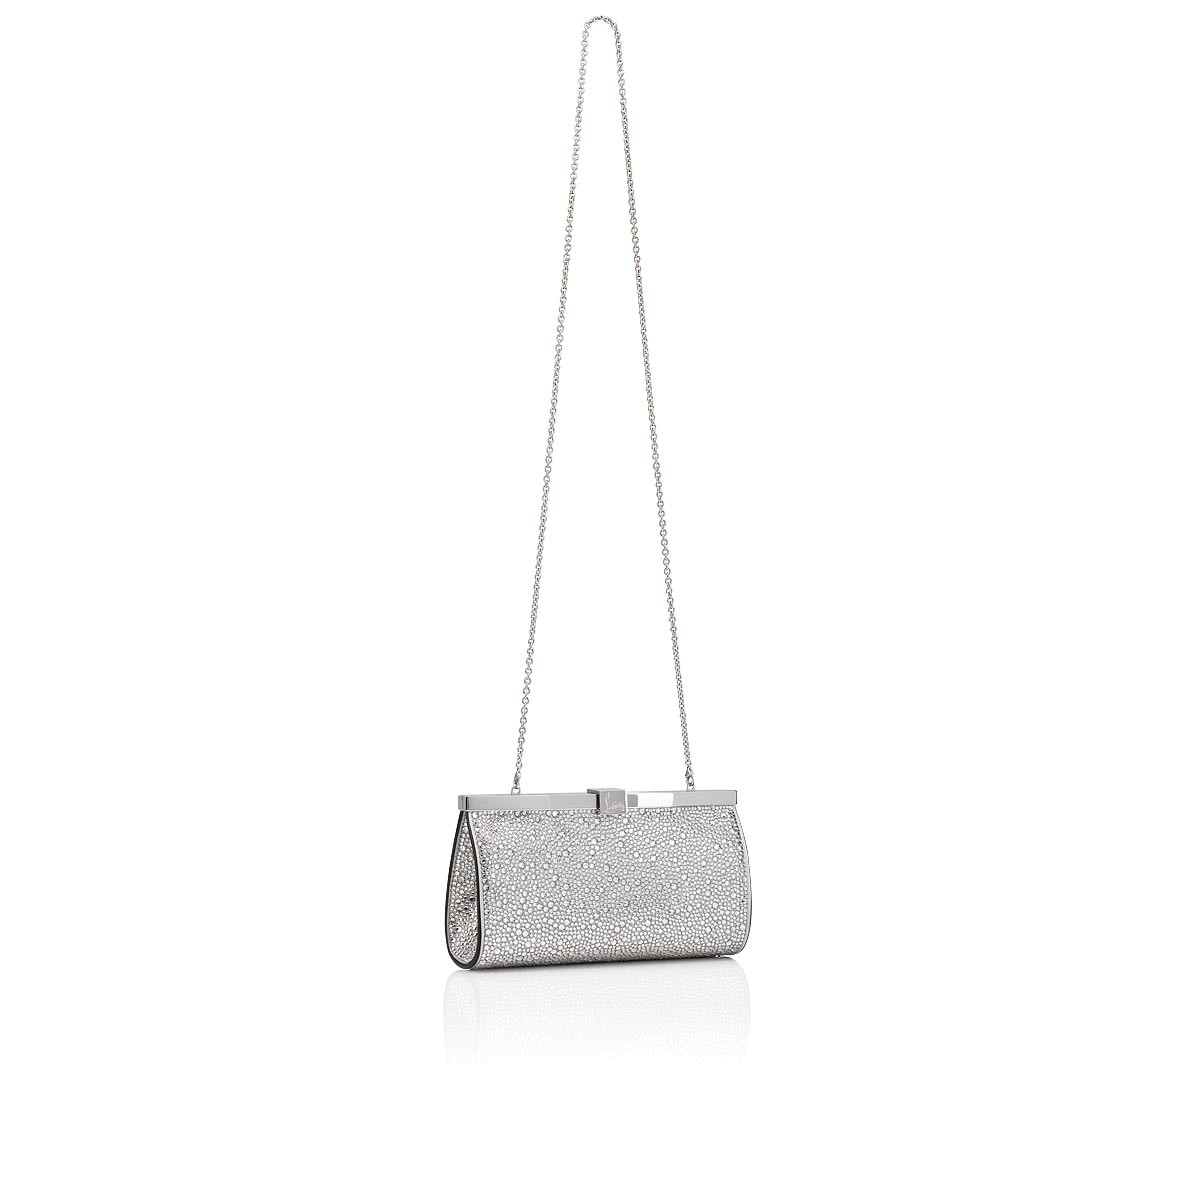 Women Bags - Palmette Clutch Small - Christian Louboutin